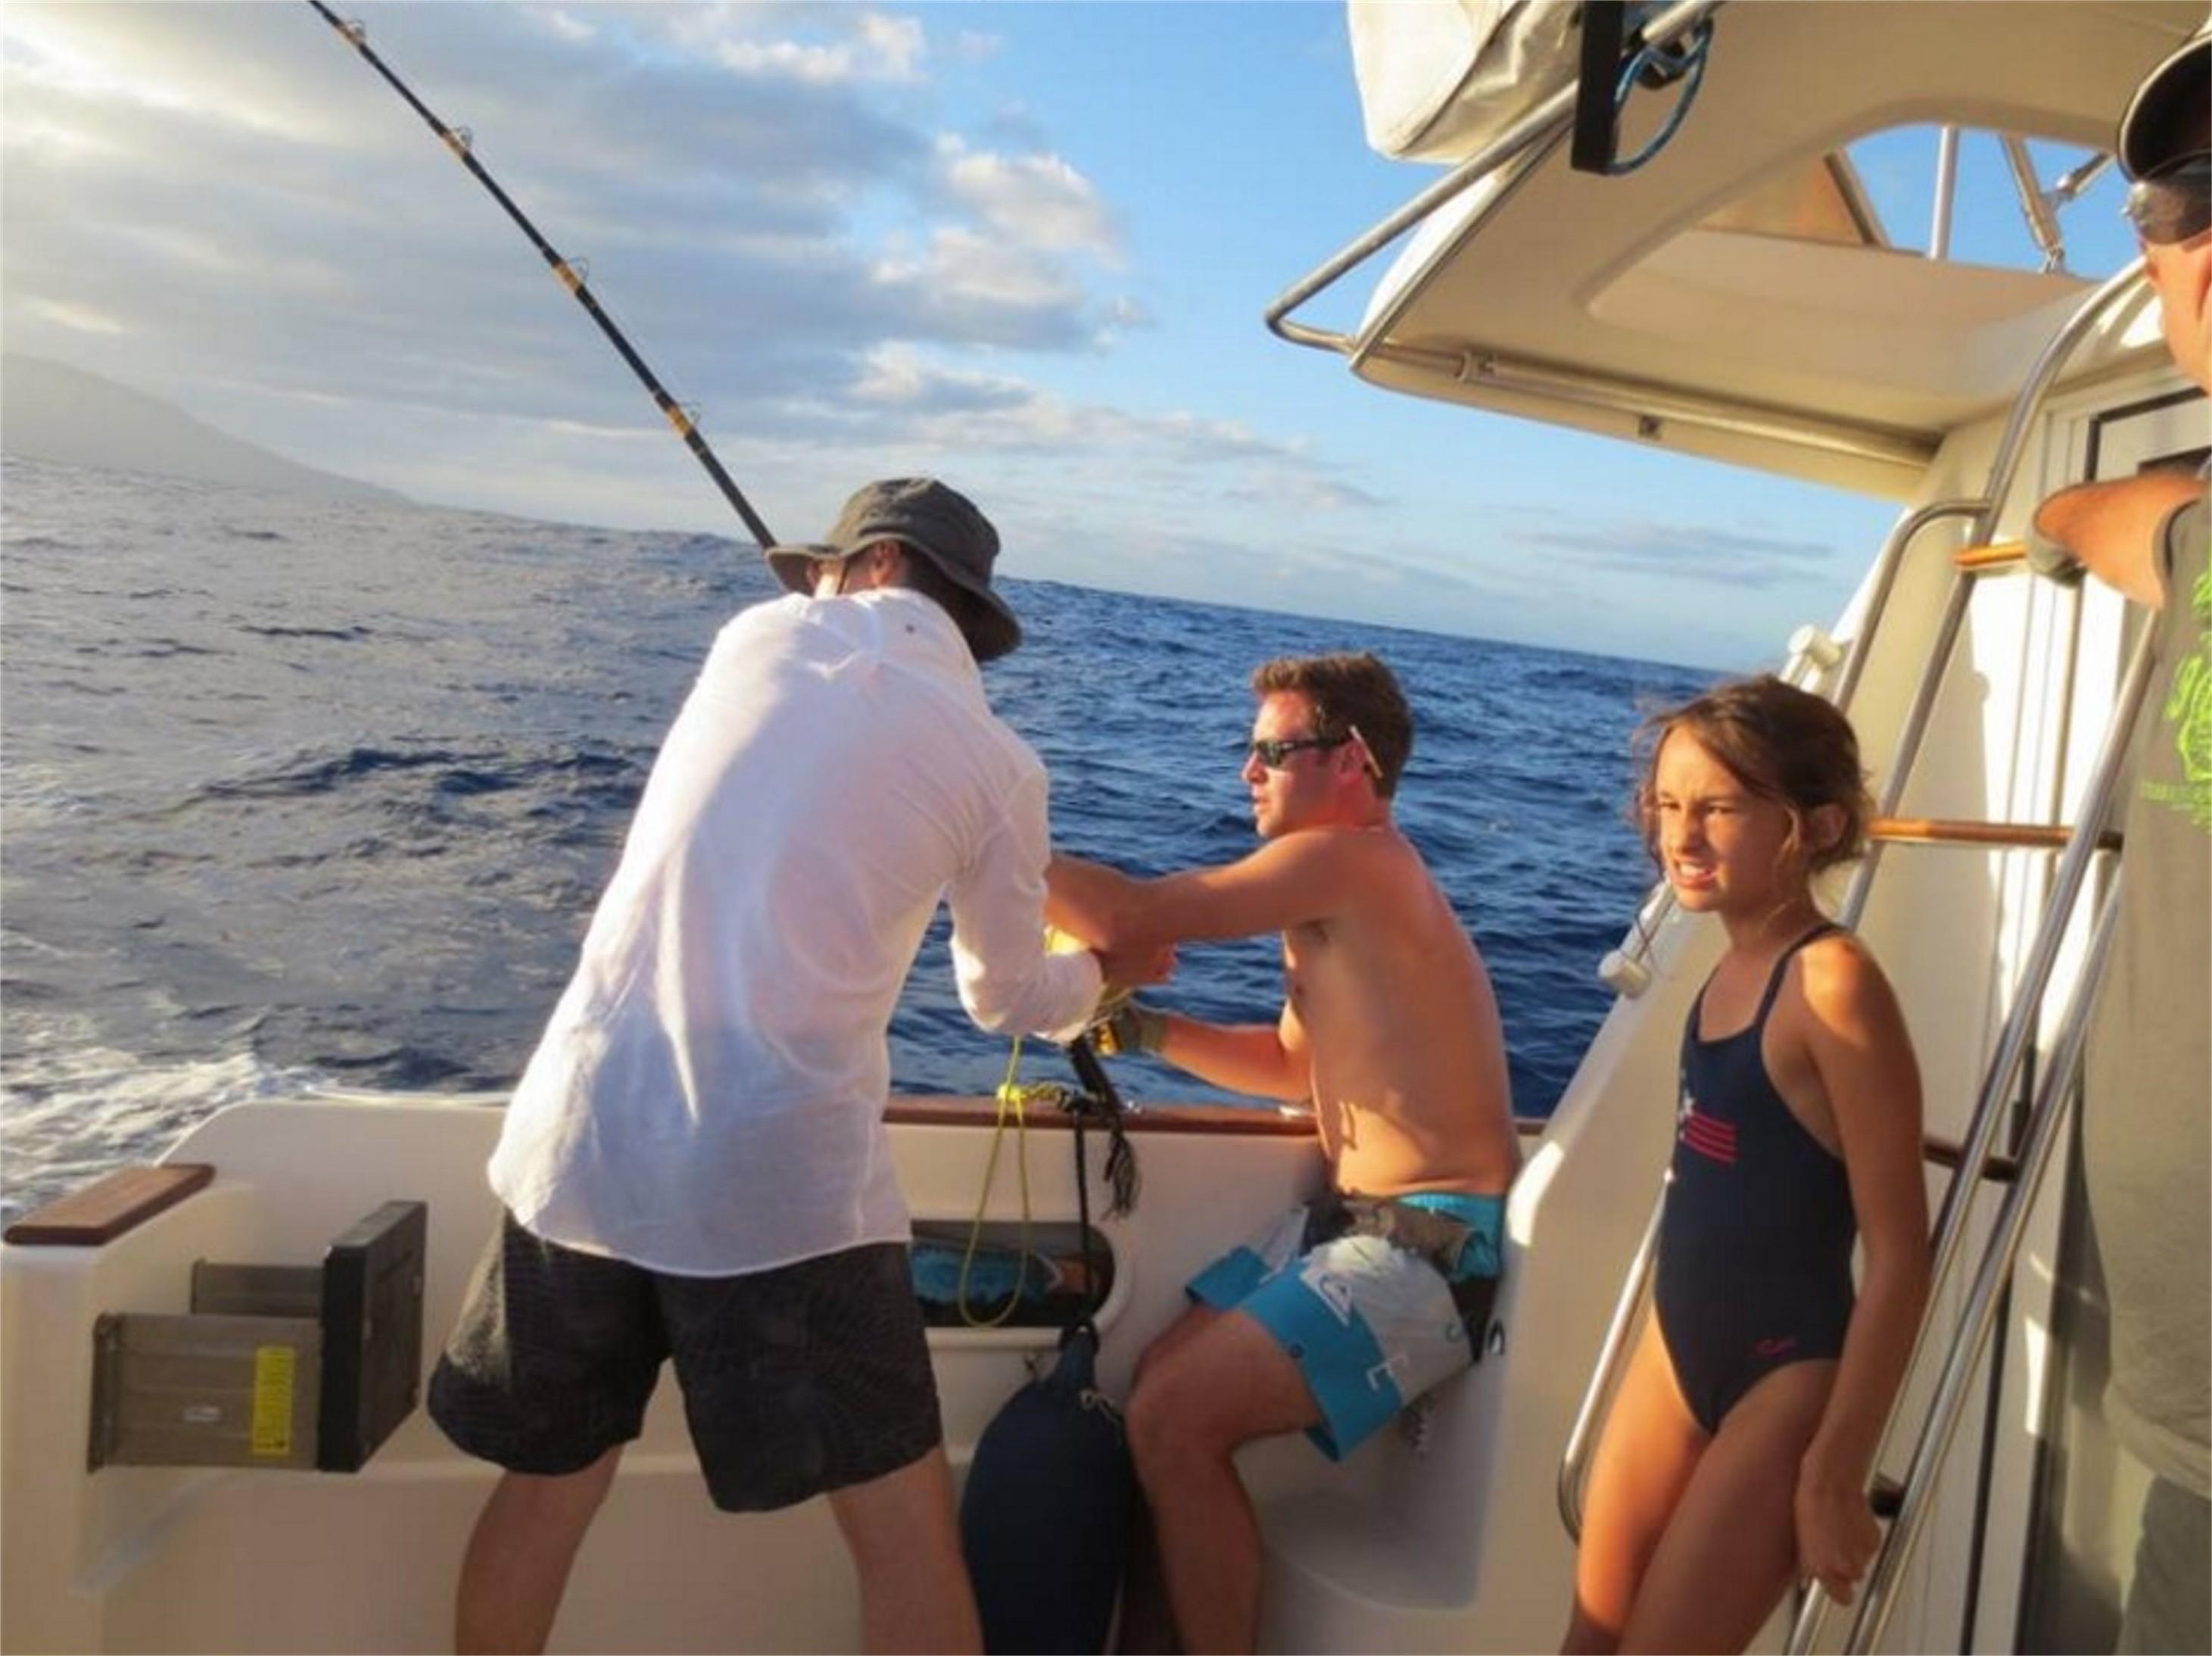 Tahiti Trip Fishing - 87 32 16 31 - sebastien.yves.boulay@mail.pf